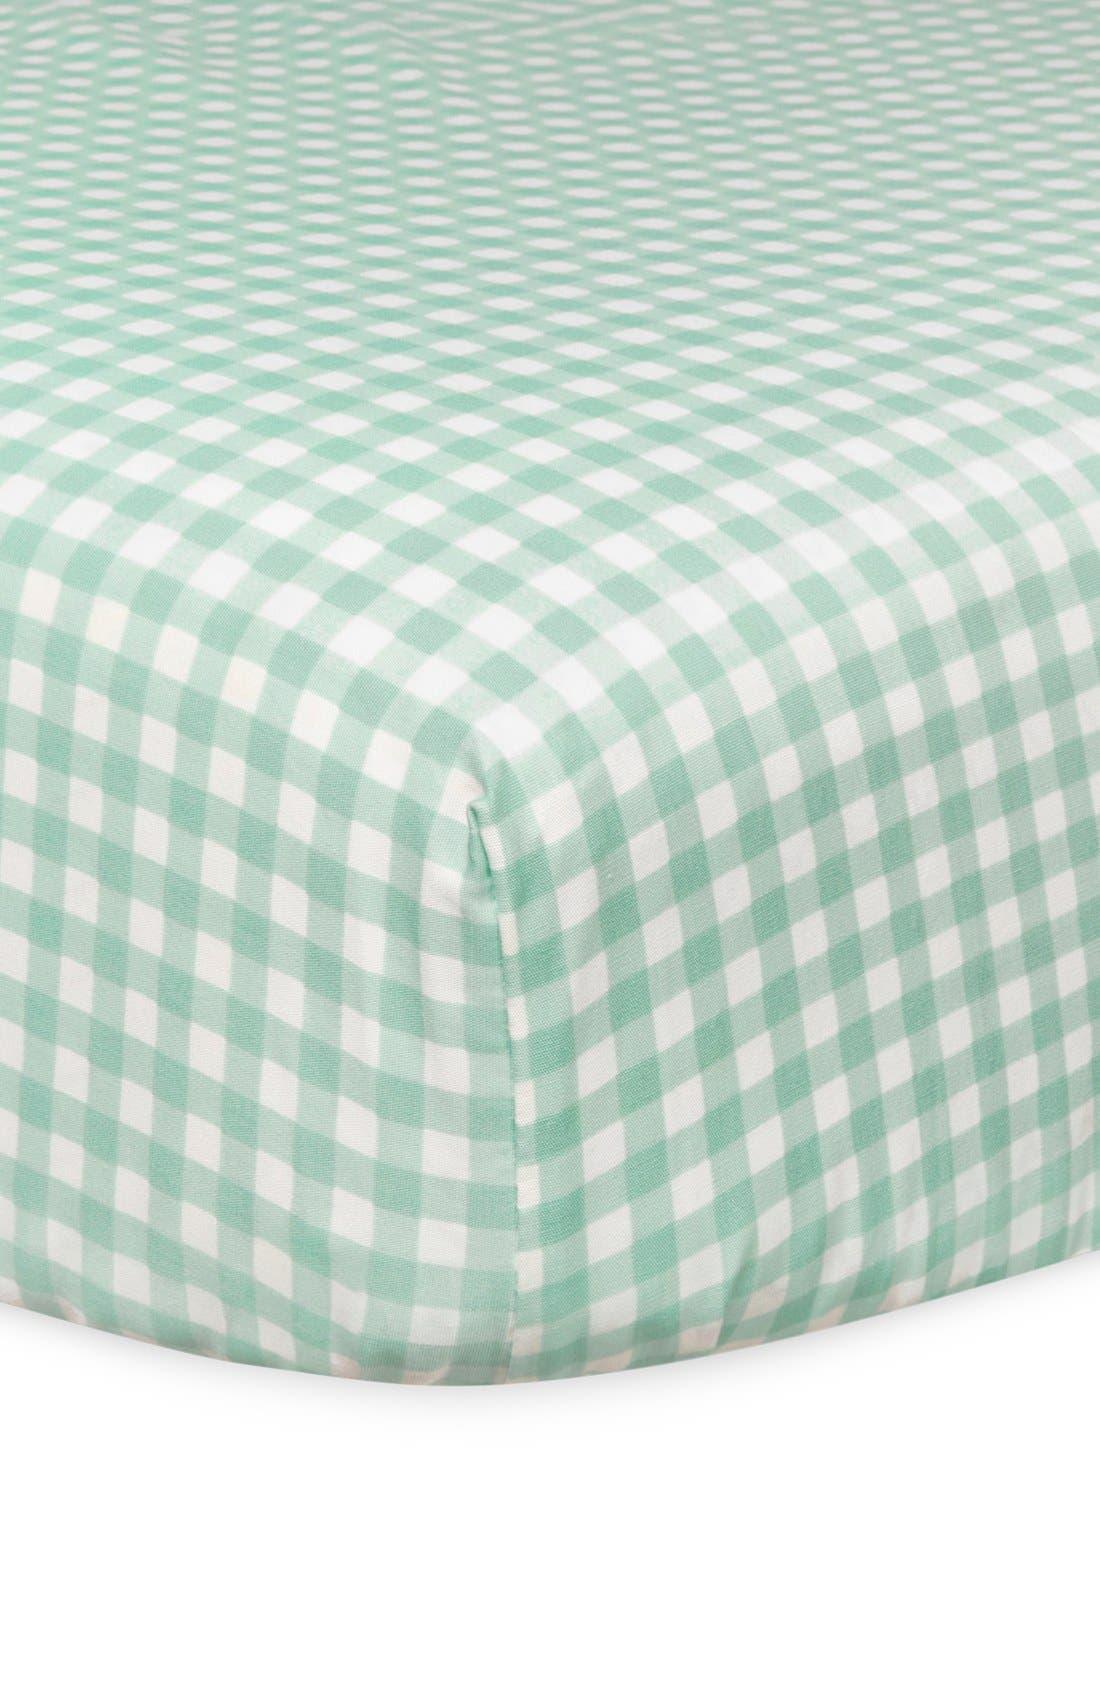 'Garden' Crib Sheet, Crib Skirt, Stroller Blanket & Wall Decals,                             Alternate thumbnail 5, color,                             Blue